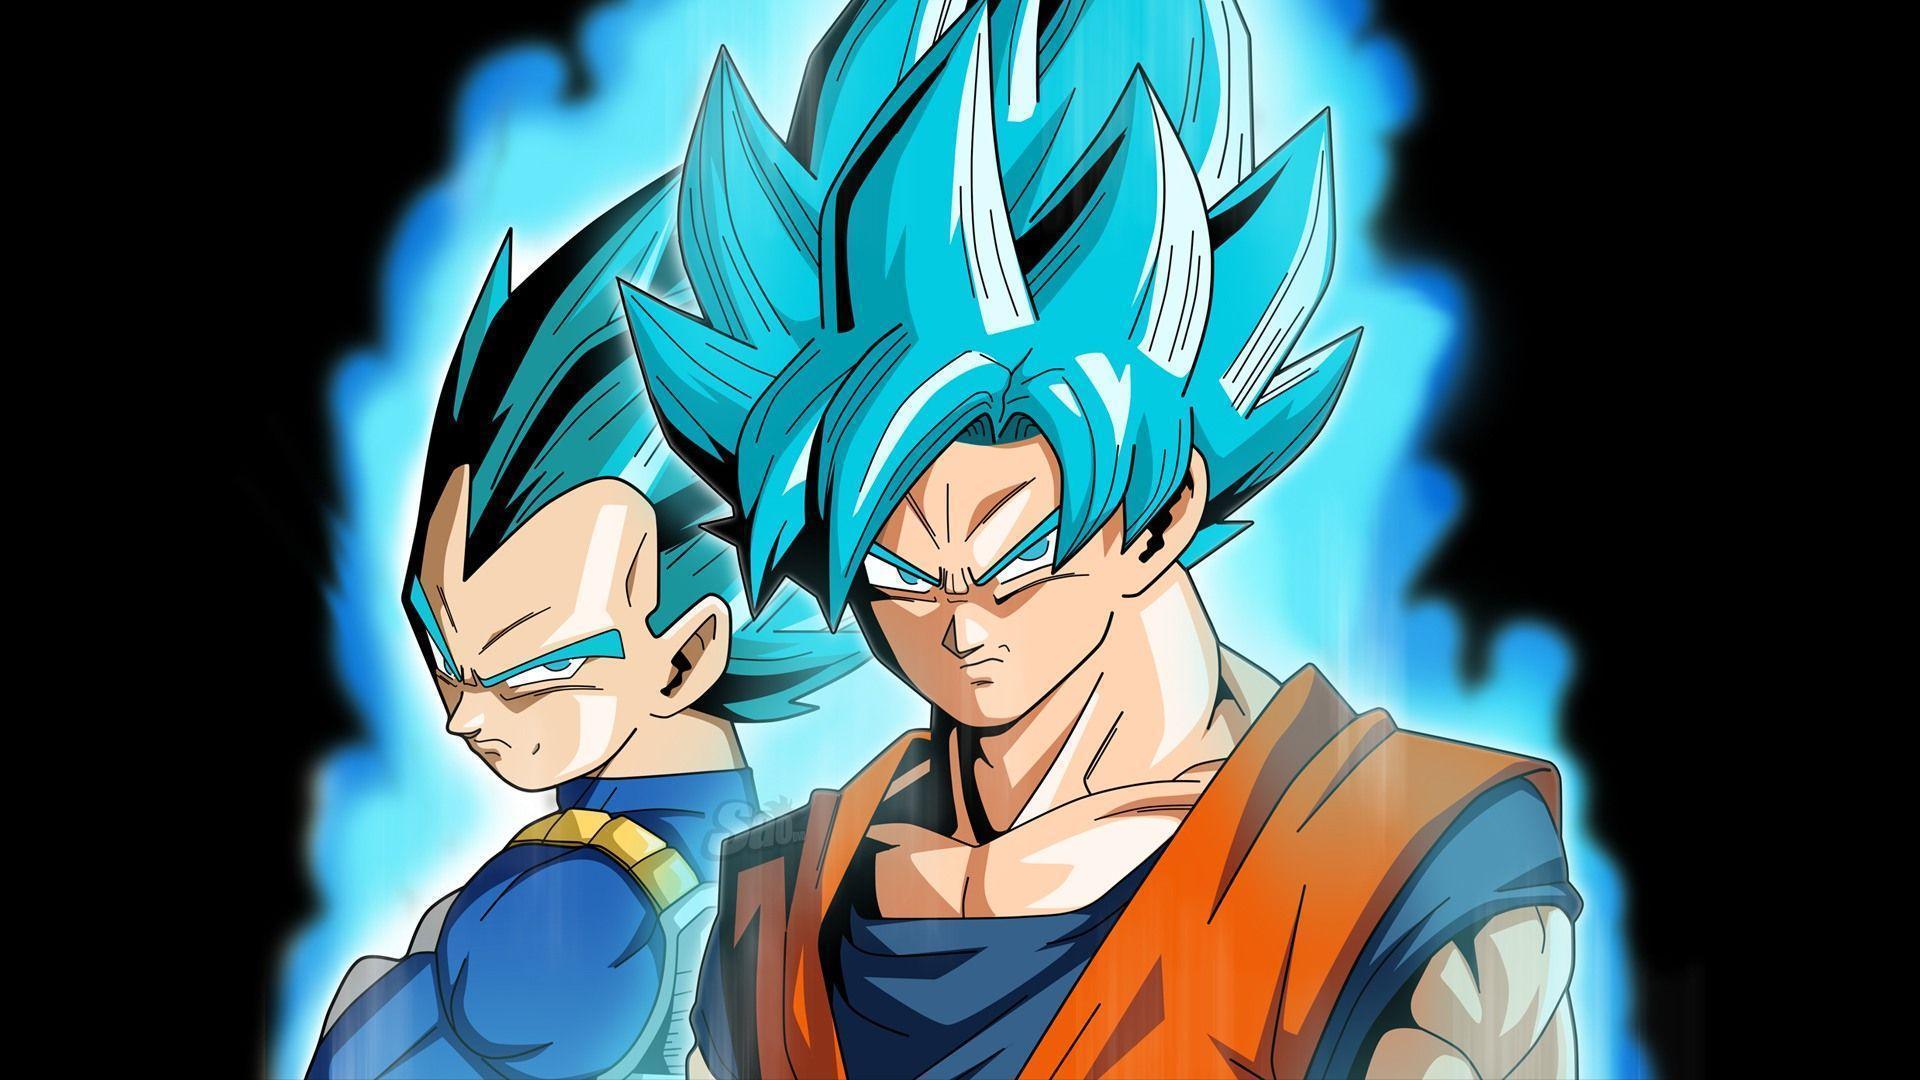 Dbz Vegeta Wallpaper Hd Goku And Vegeta Blue 1920x1080 Wallpaper Teahub Io